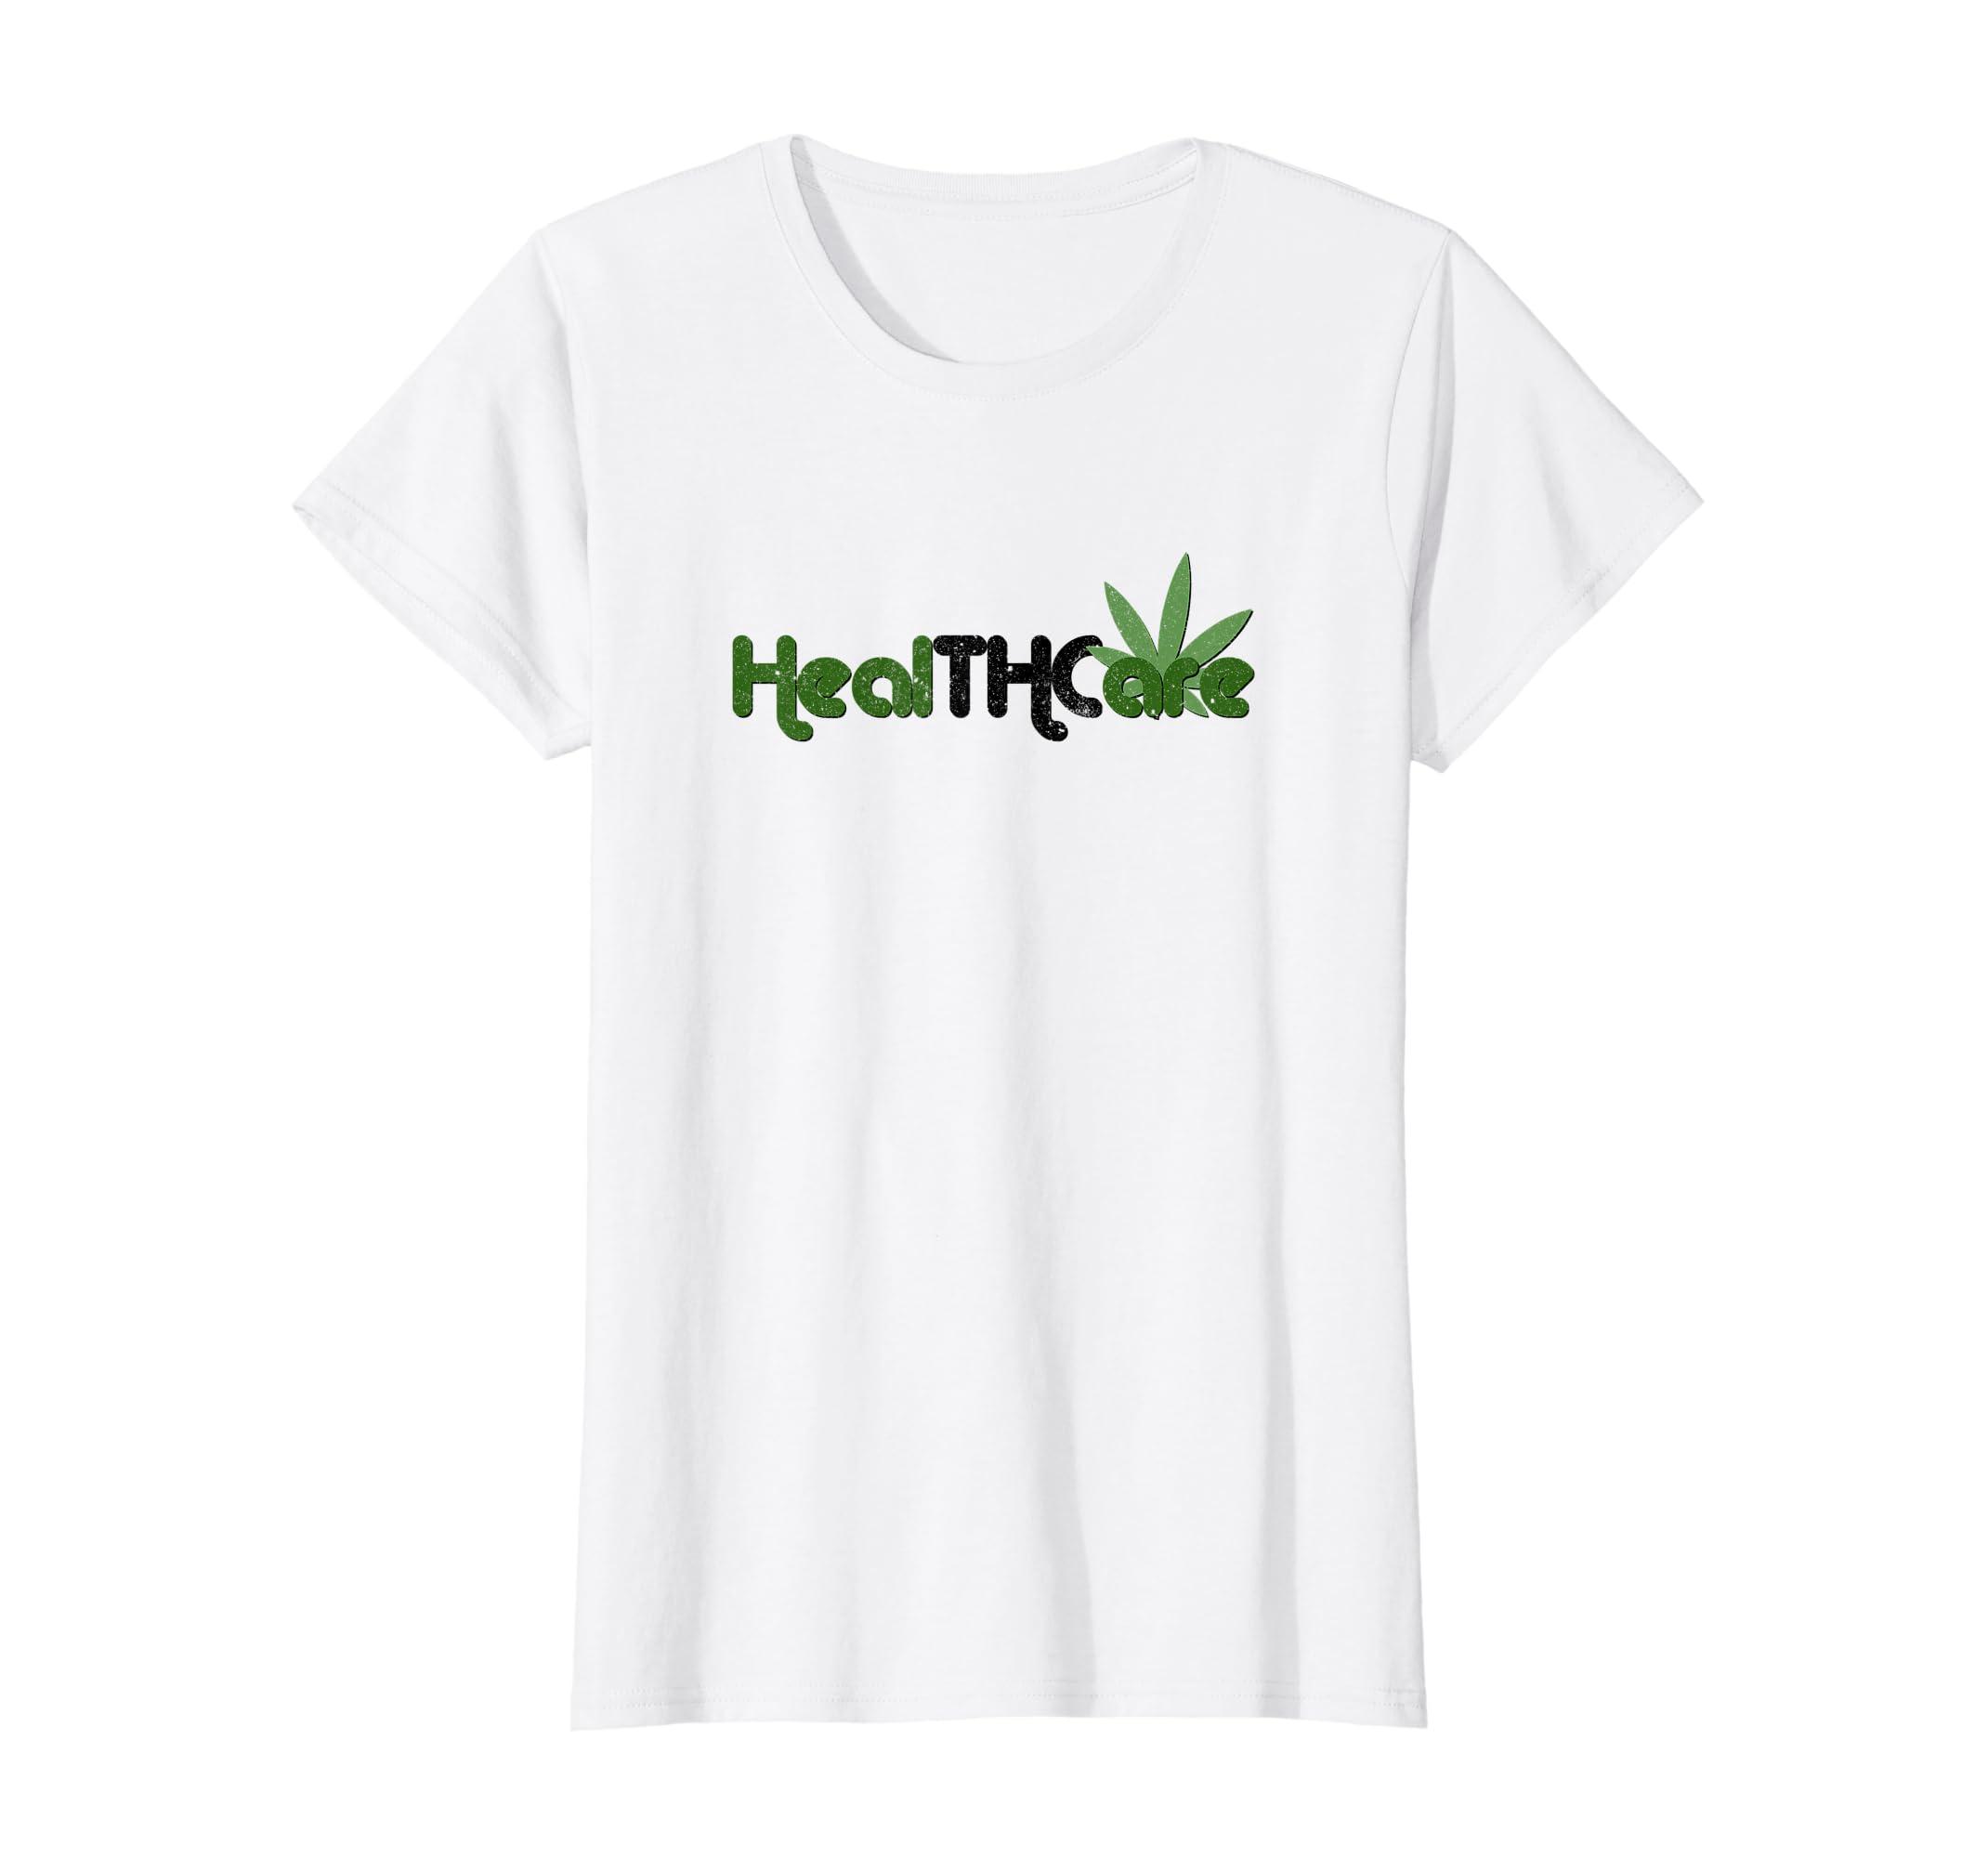 71eebef8 Amazon.com: Healthcare THC Retro Design T-Shirt, Hemp CBD Oil: Clothing